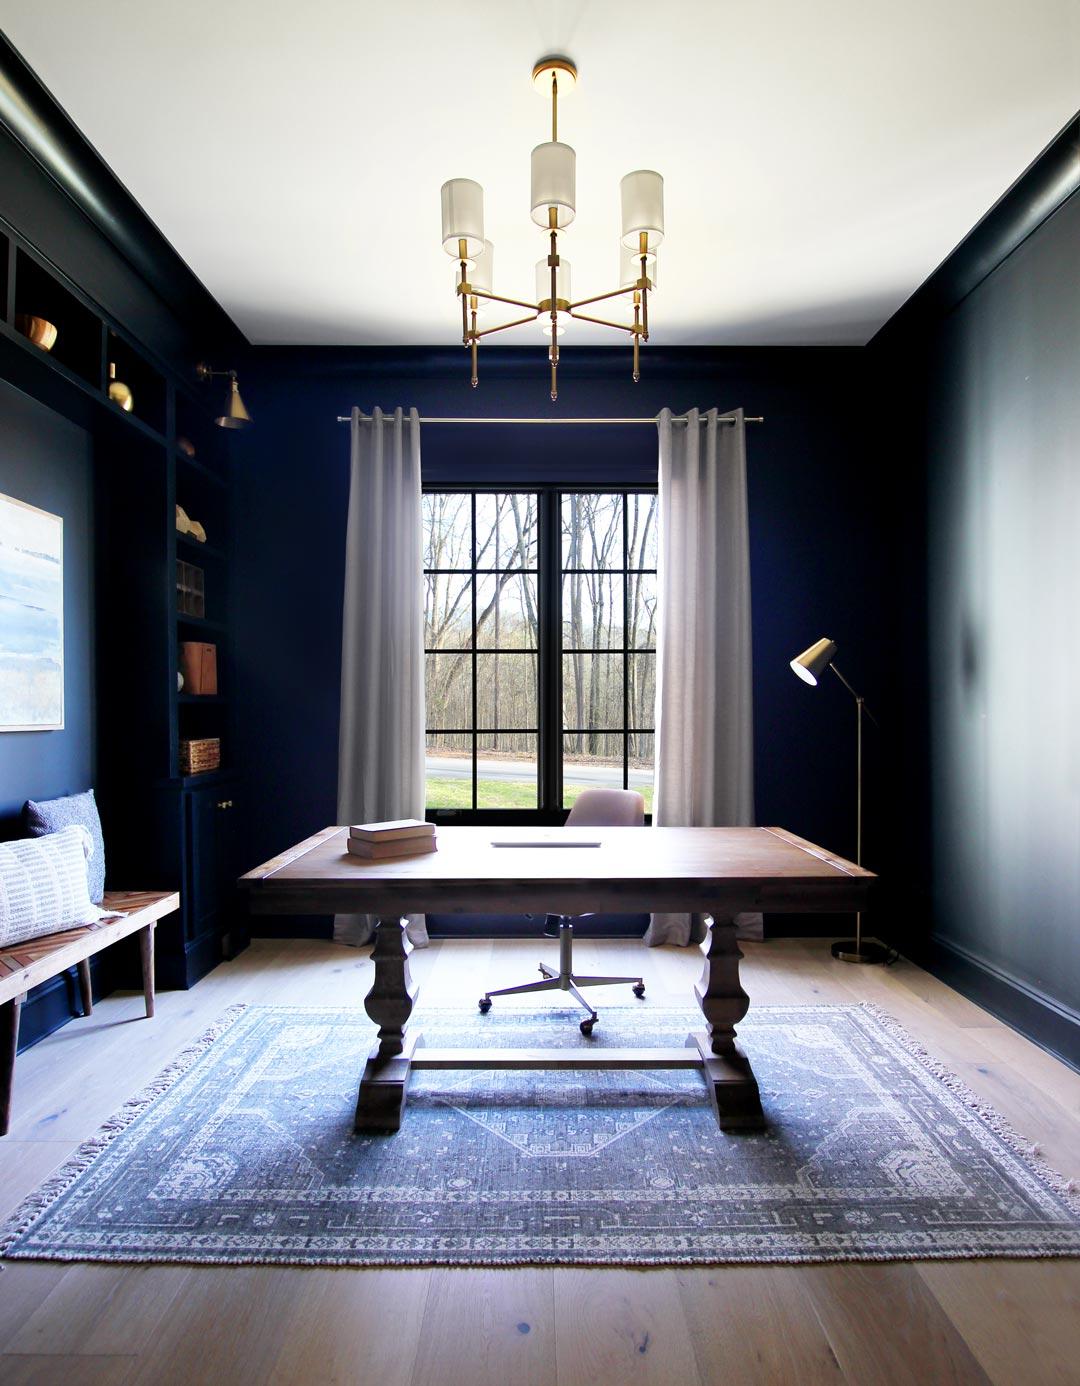 recessed lighting vs ceiling fixtures